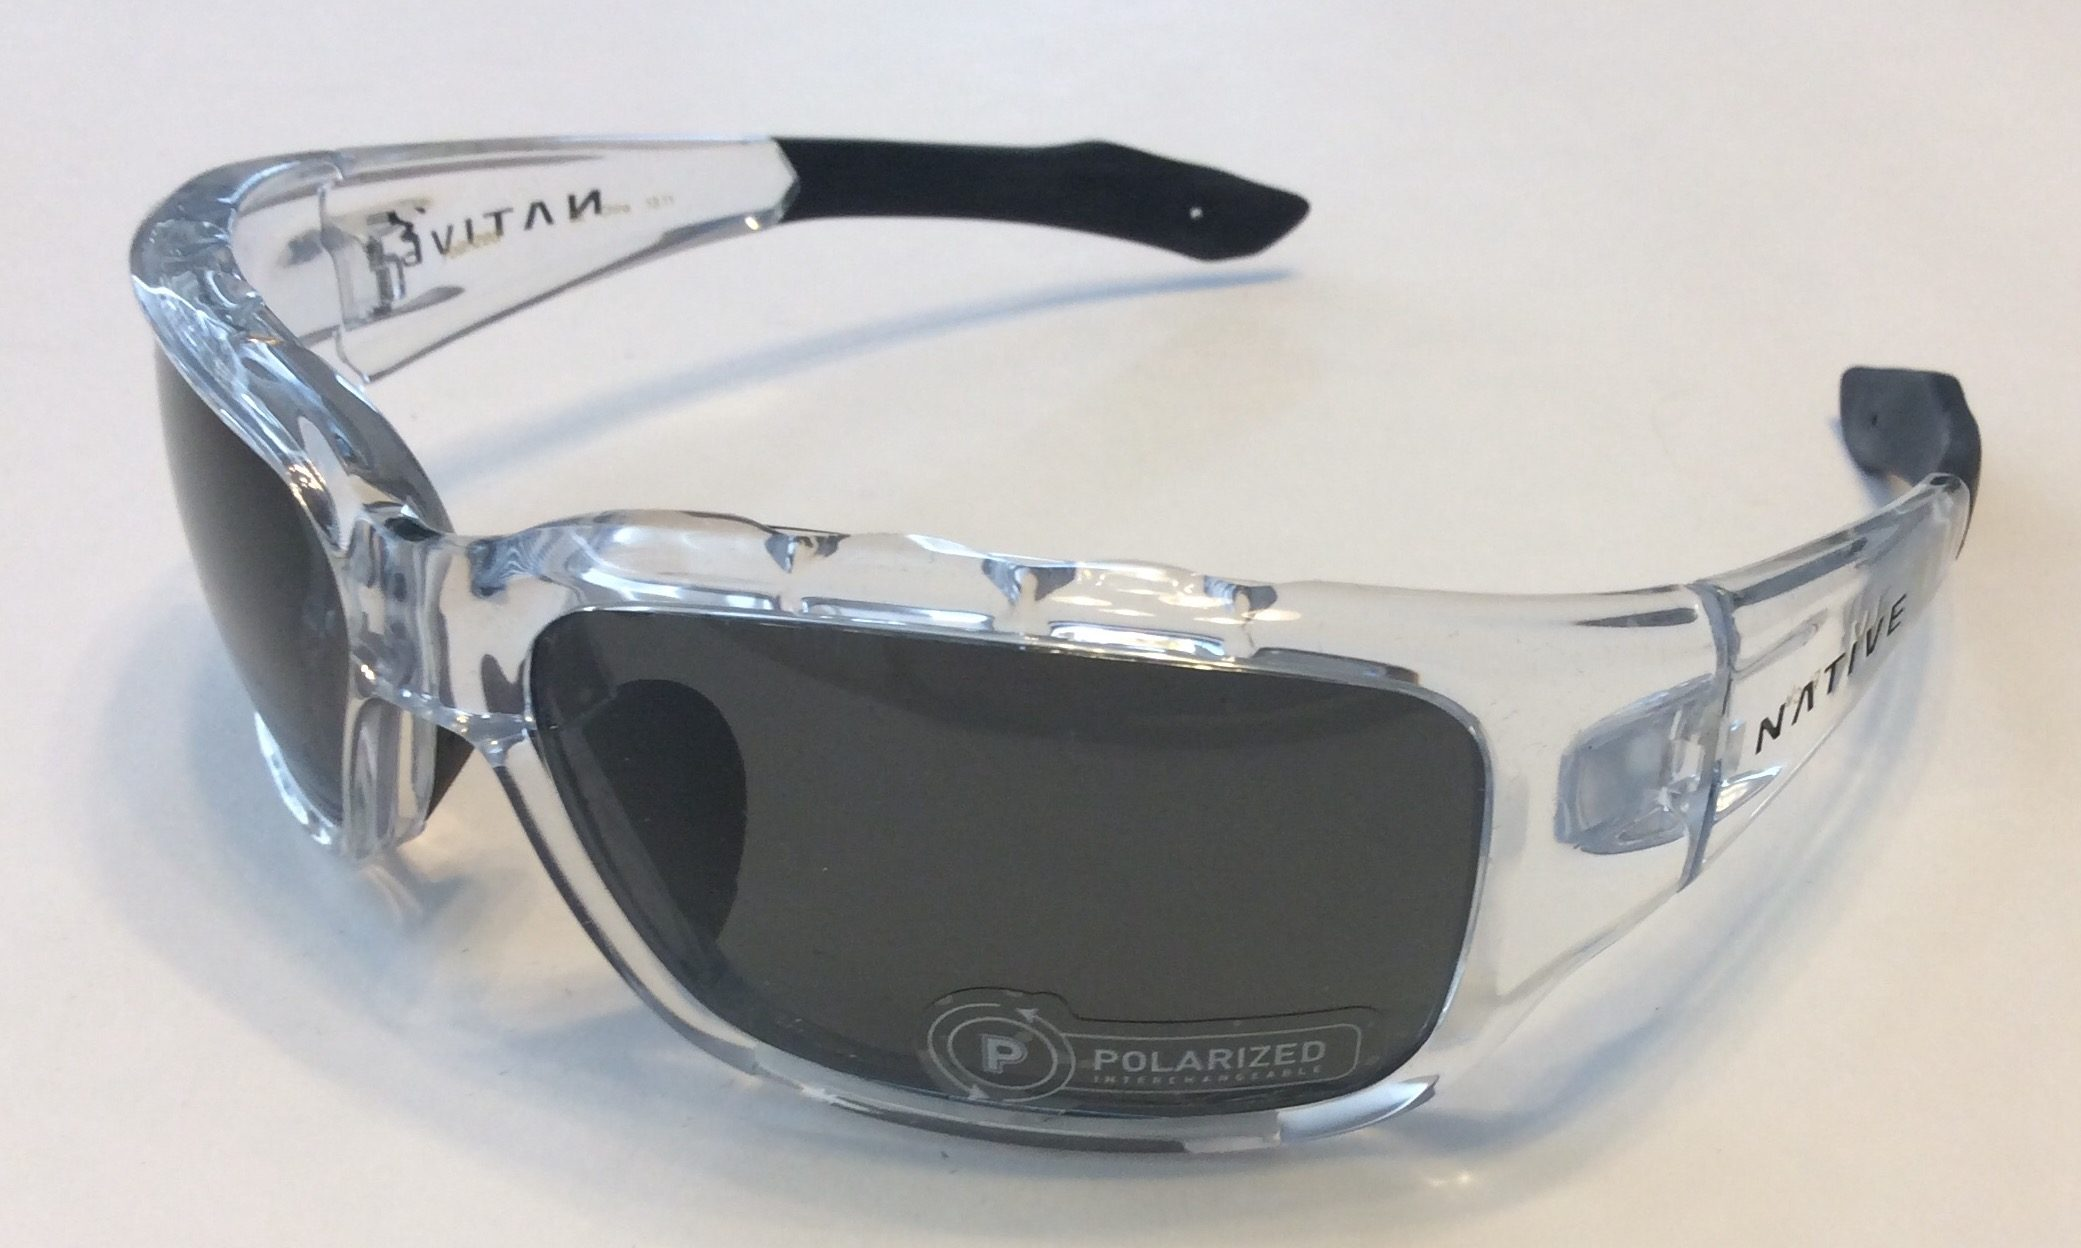 0f0e34ab84 Native Eyewear Bolder Sunglasses - Crystal   Black - POLARIZED Gray XTRA  Lens